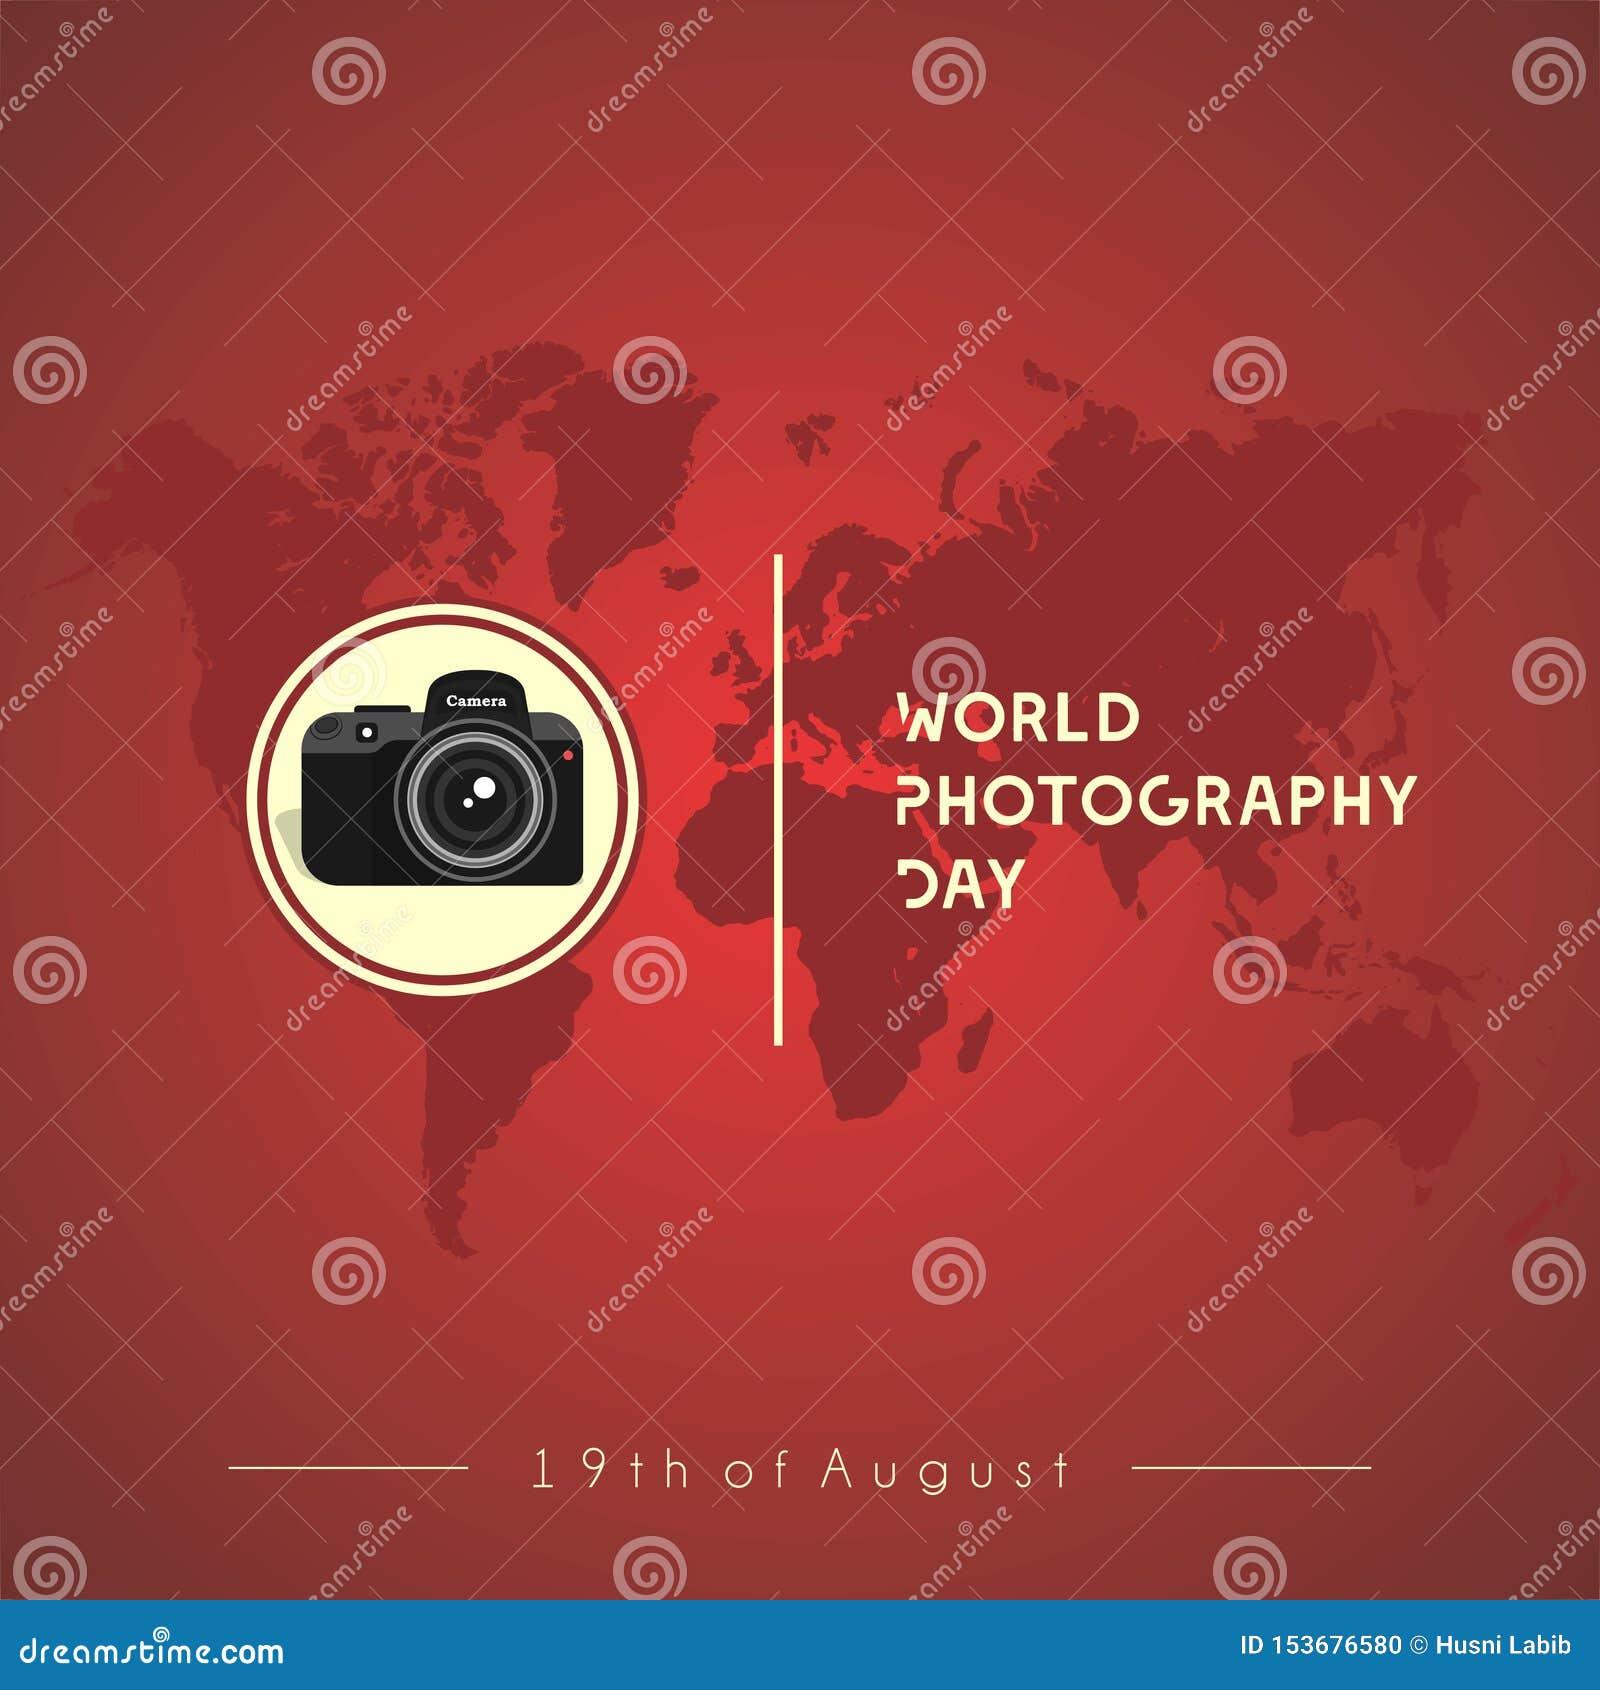 Camera Vector Design World Photography Day Stock Vector Illustration Of Camera Design 153676580